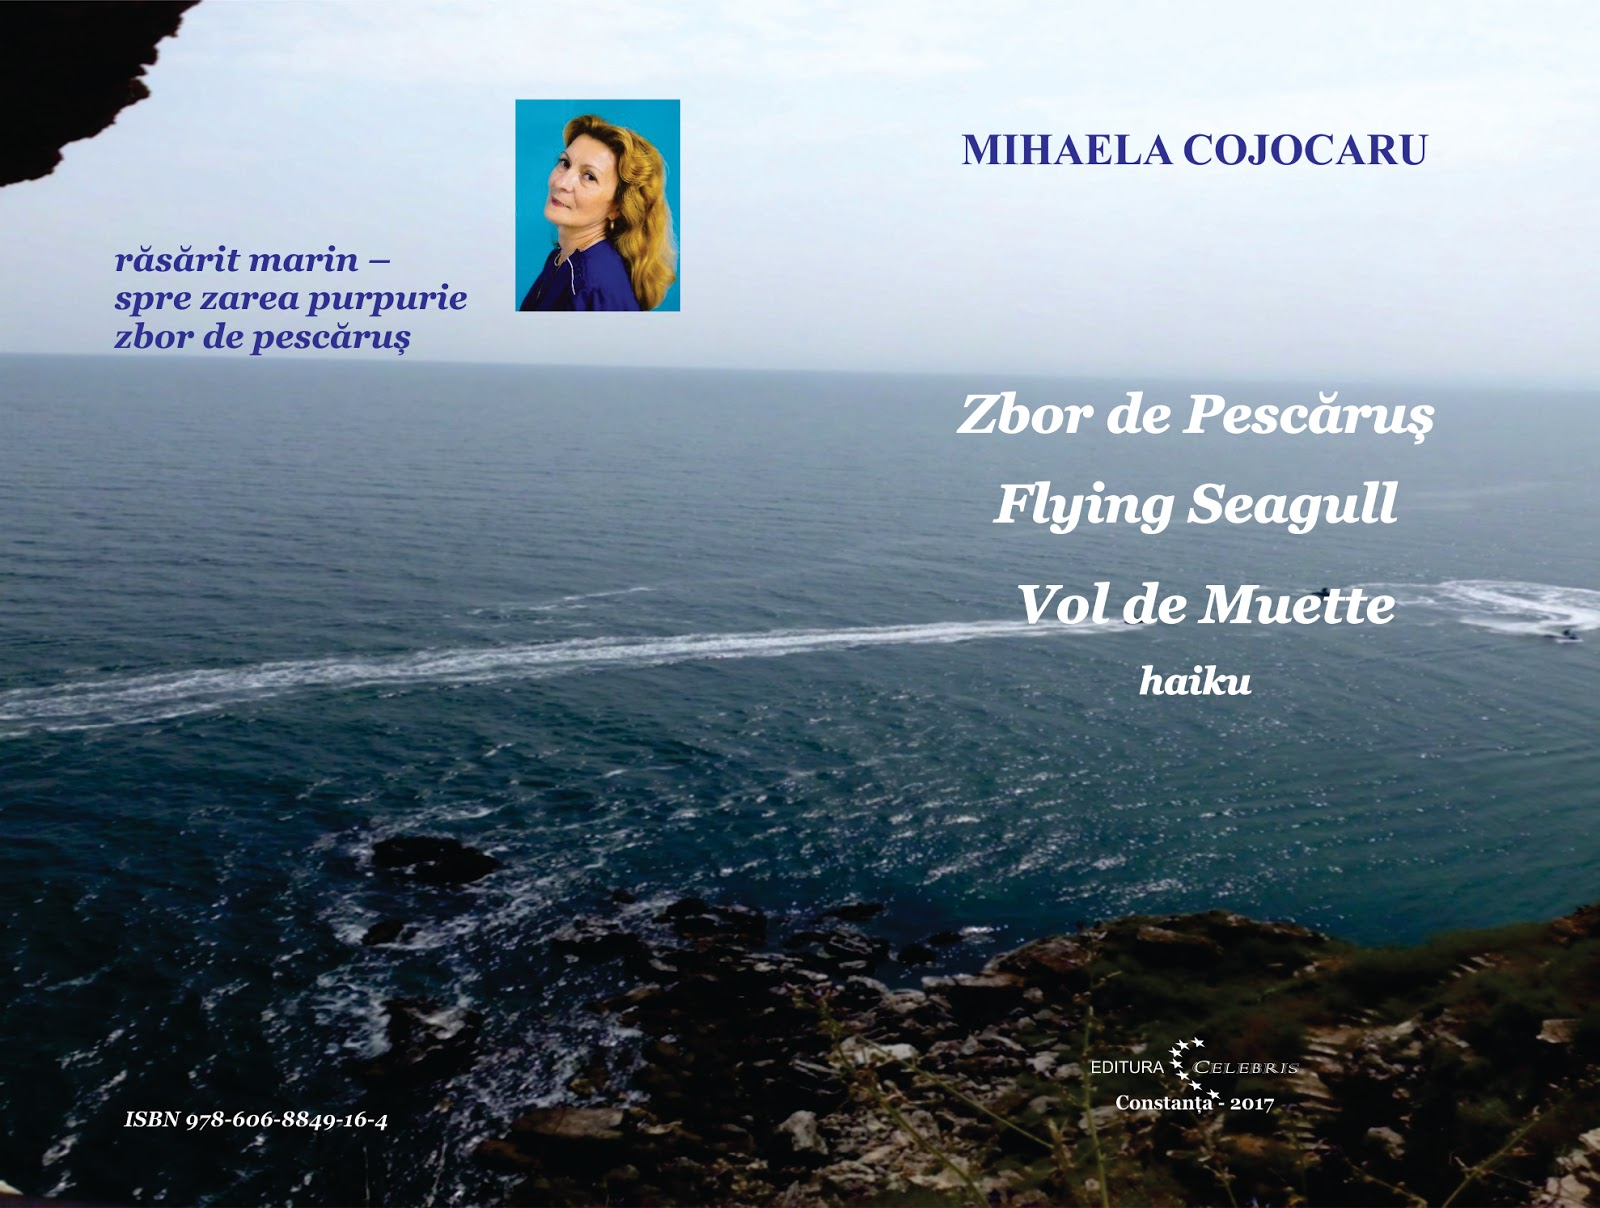 Mihaela Cojocaru, Flying Seagull